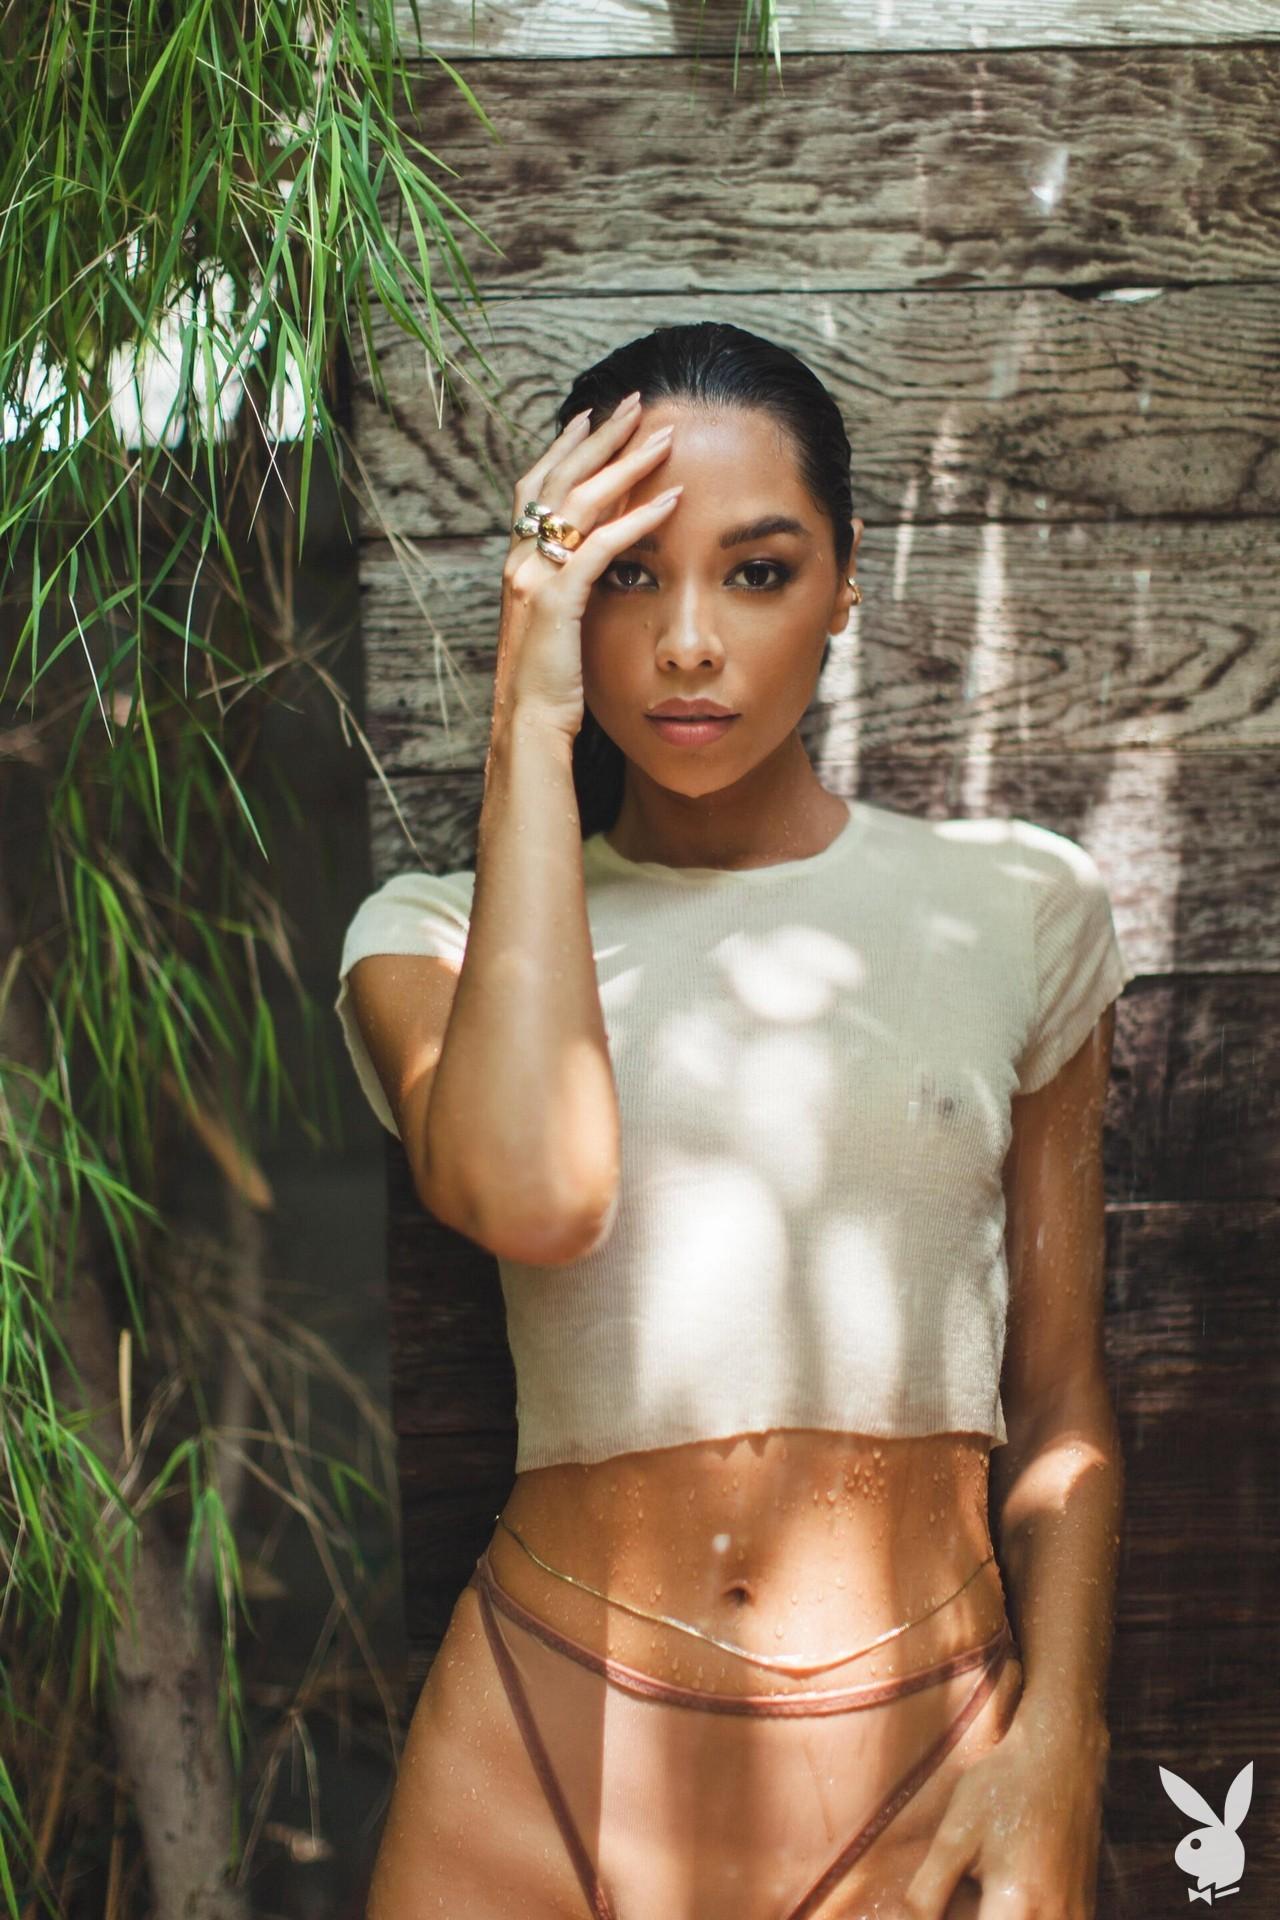 Playmate September 2020 Danielle Alcaraz Playboy Plus (3)